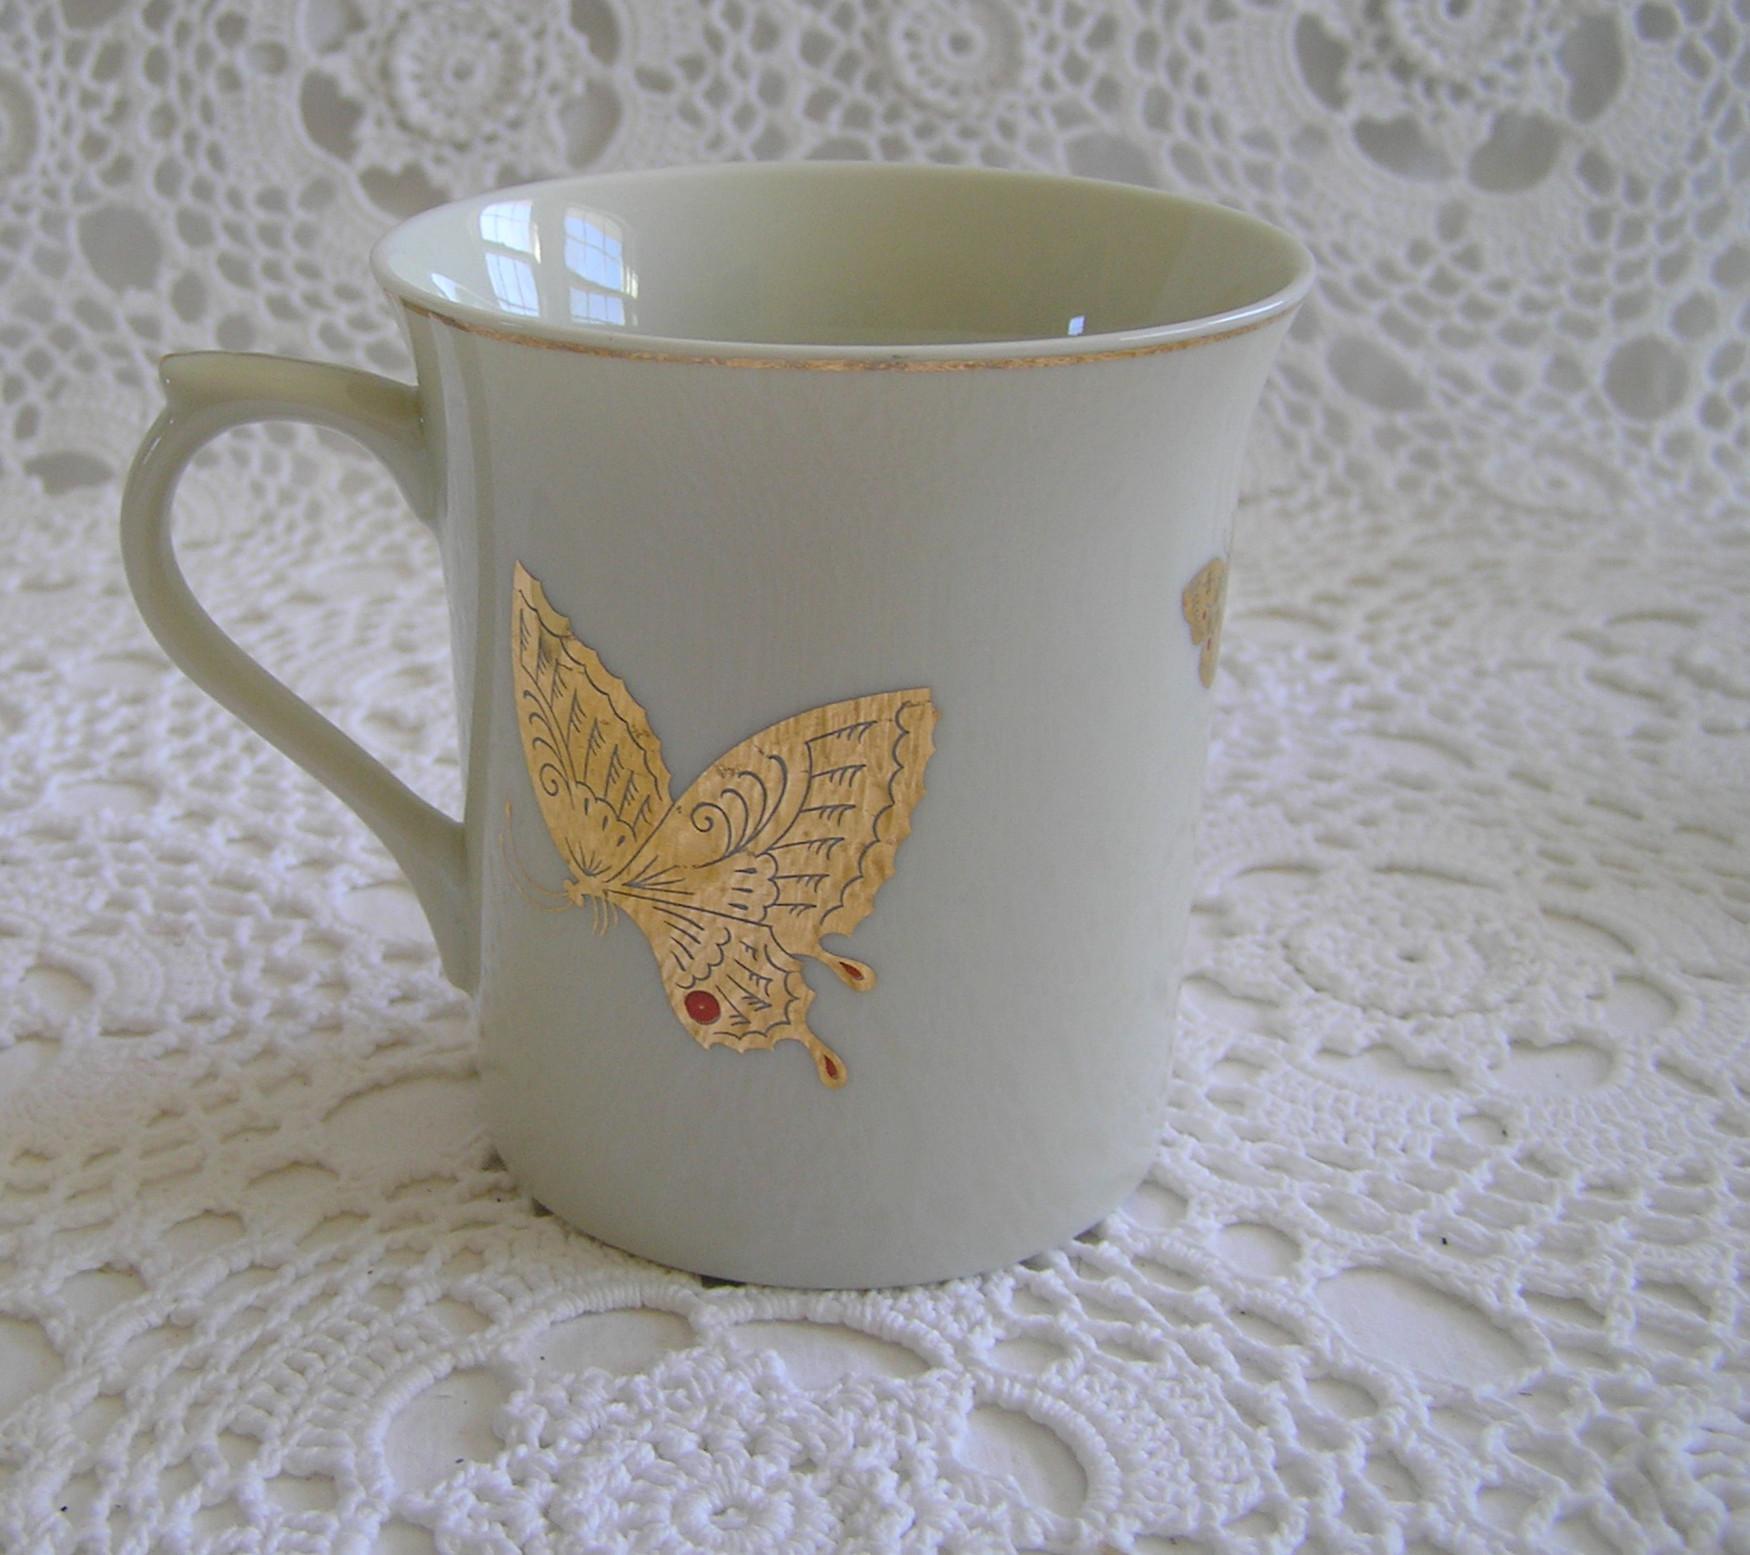 Takahashi San Francisco Porcelain Gold Leaf Butterfly Tea Cups   Set Of 4    Image 4